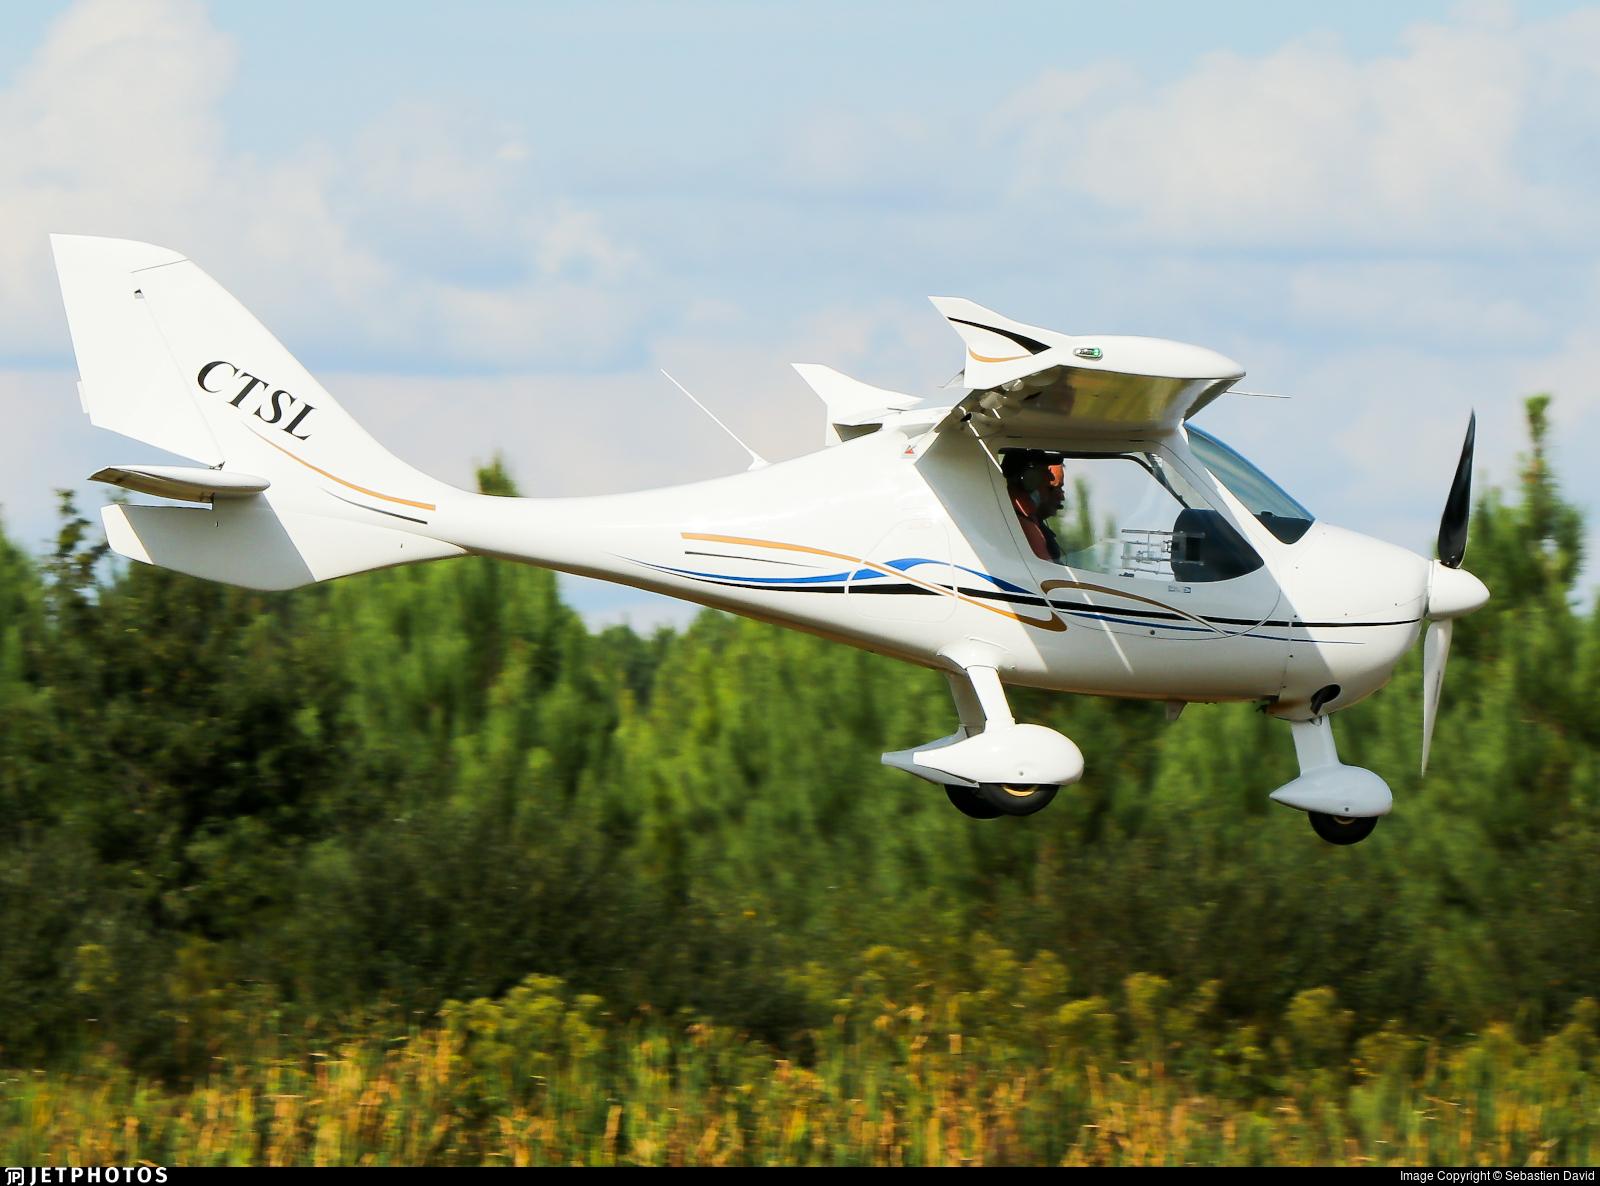 33APA - Flight Design CT SupraLight - Aeroclub Andernos Les Bains